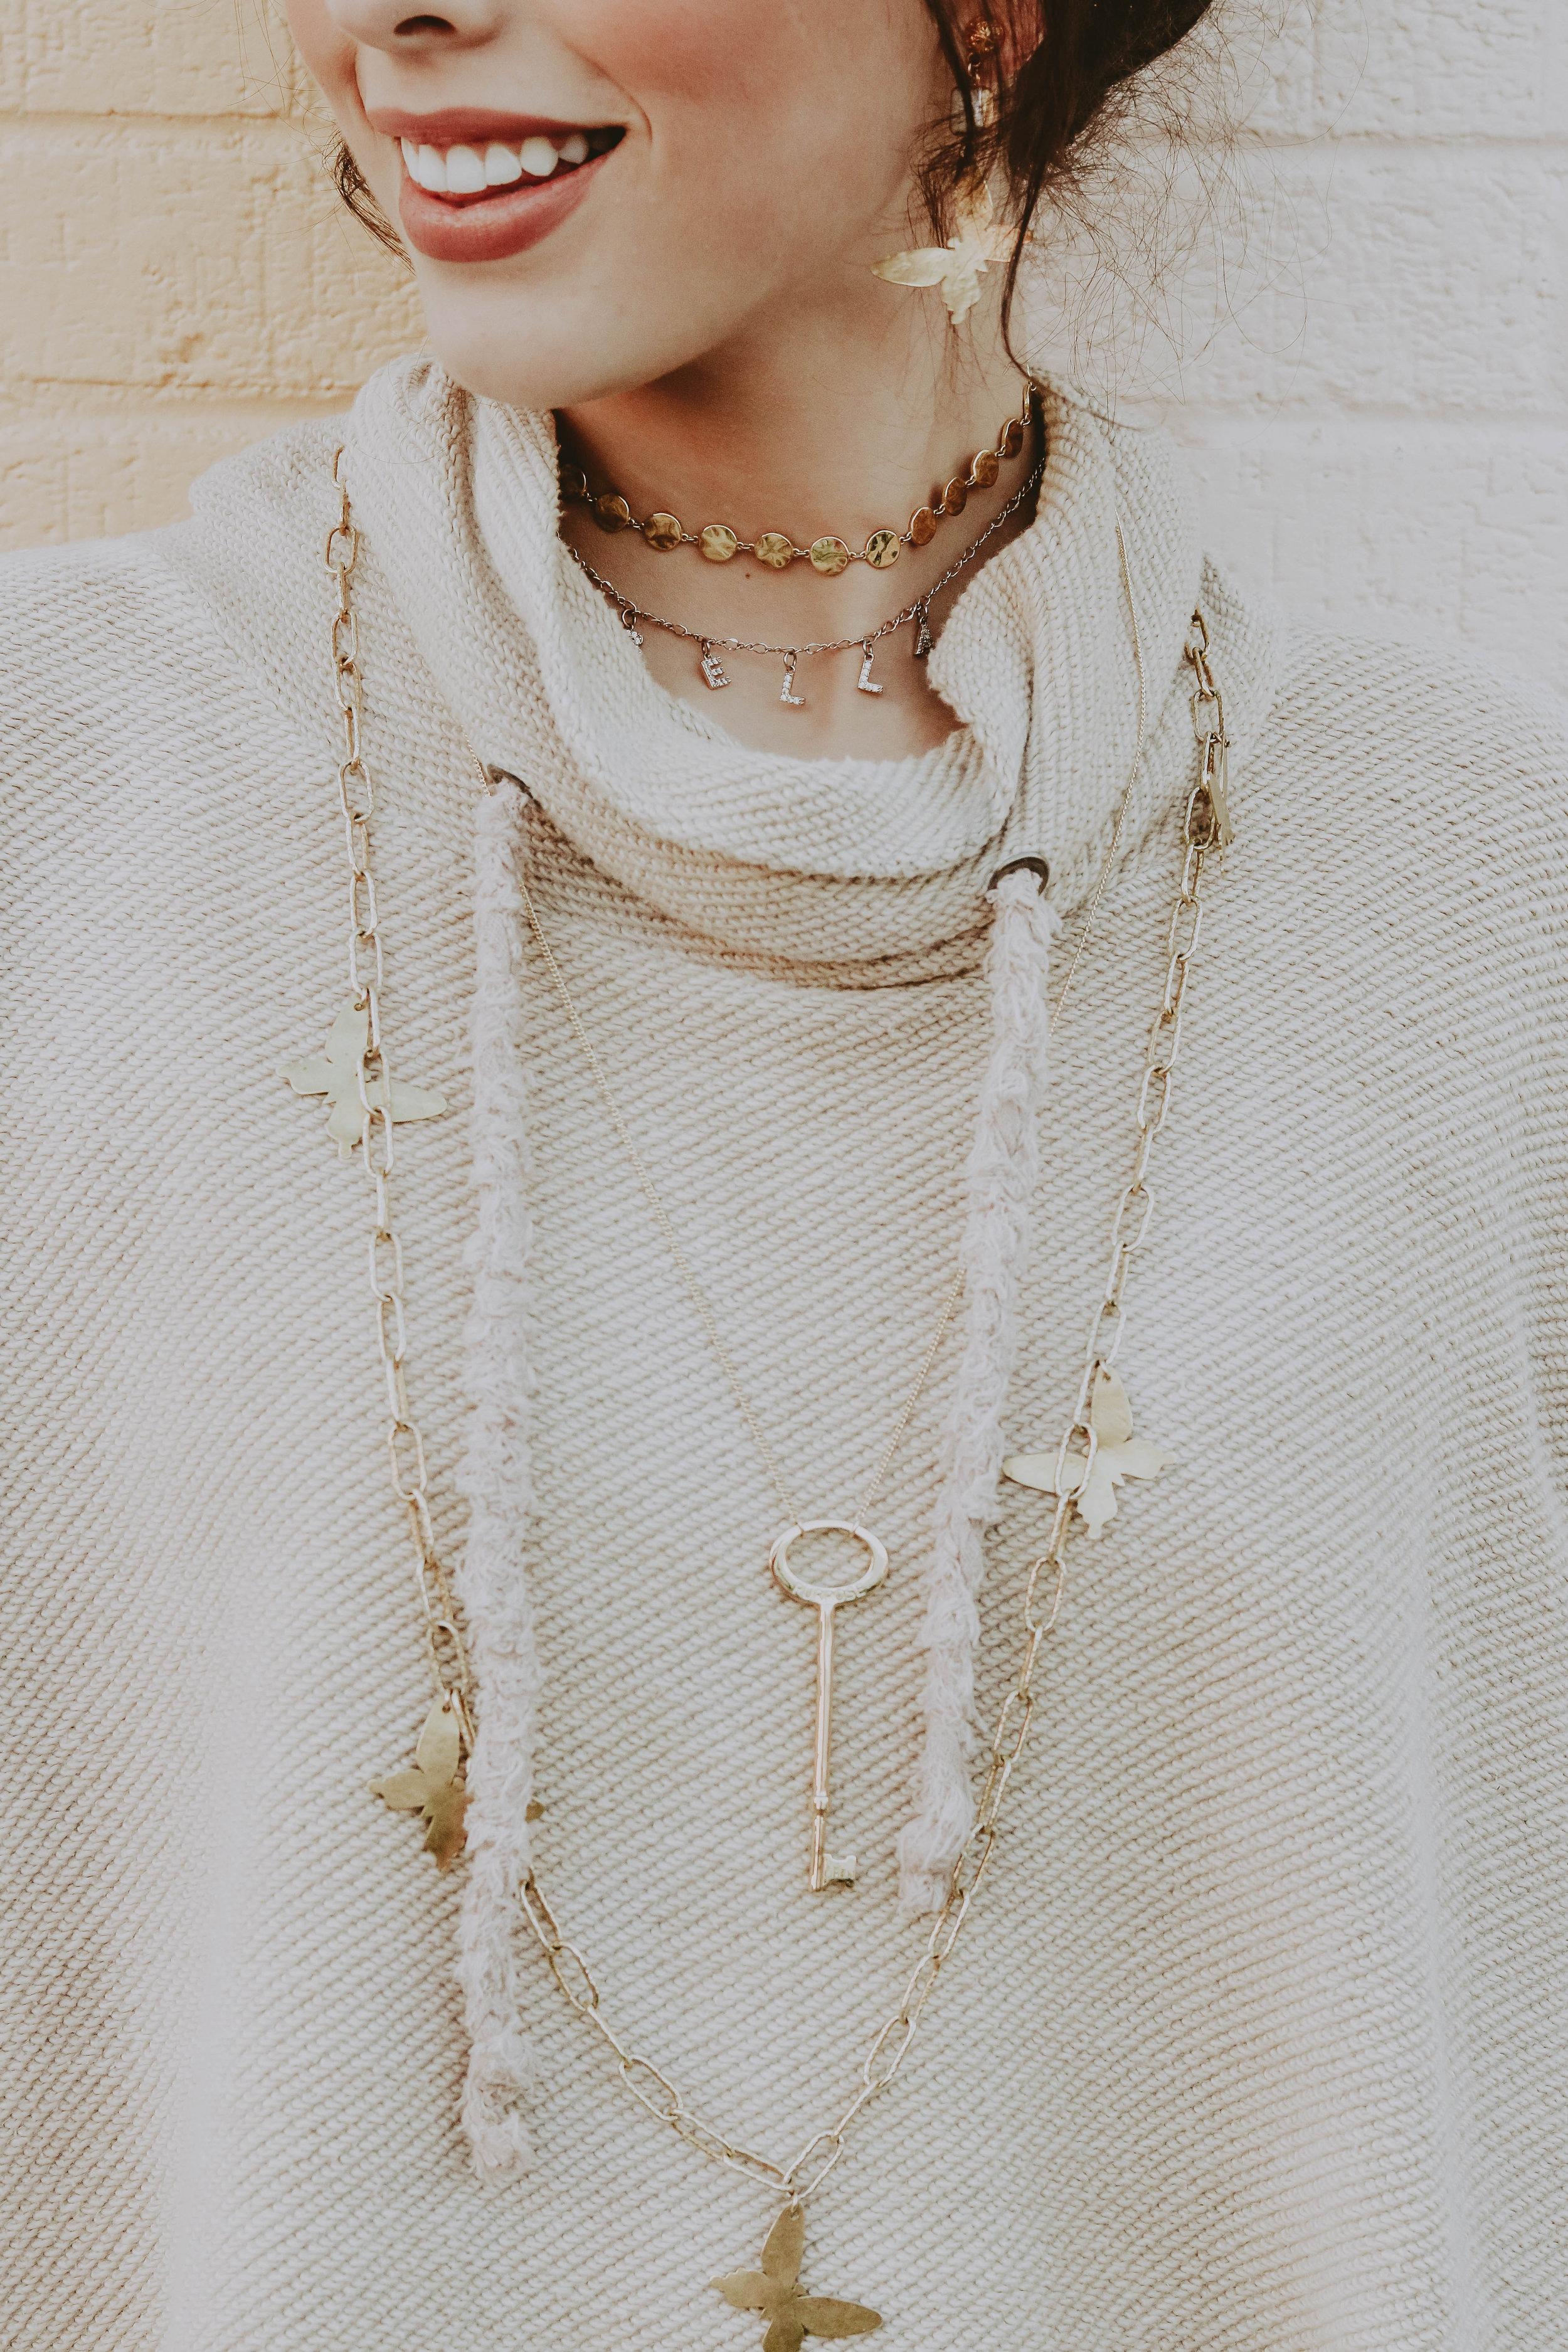 isabellahbreedlove.fashion.jpeg